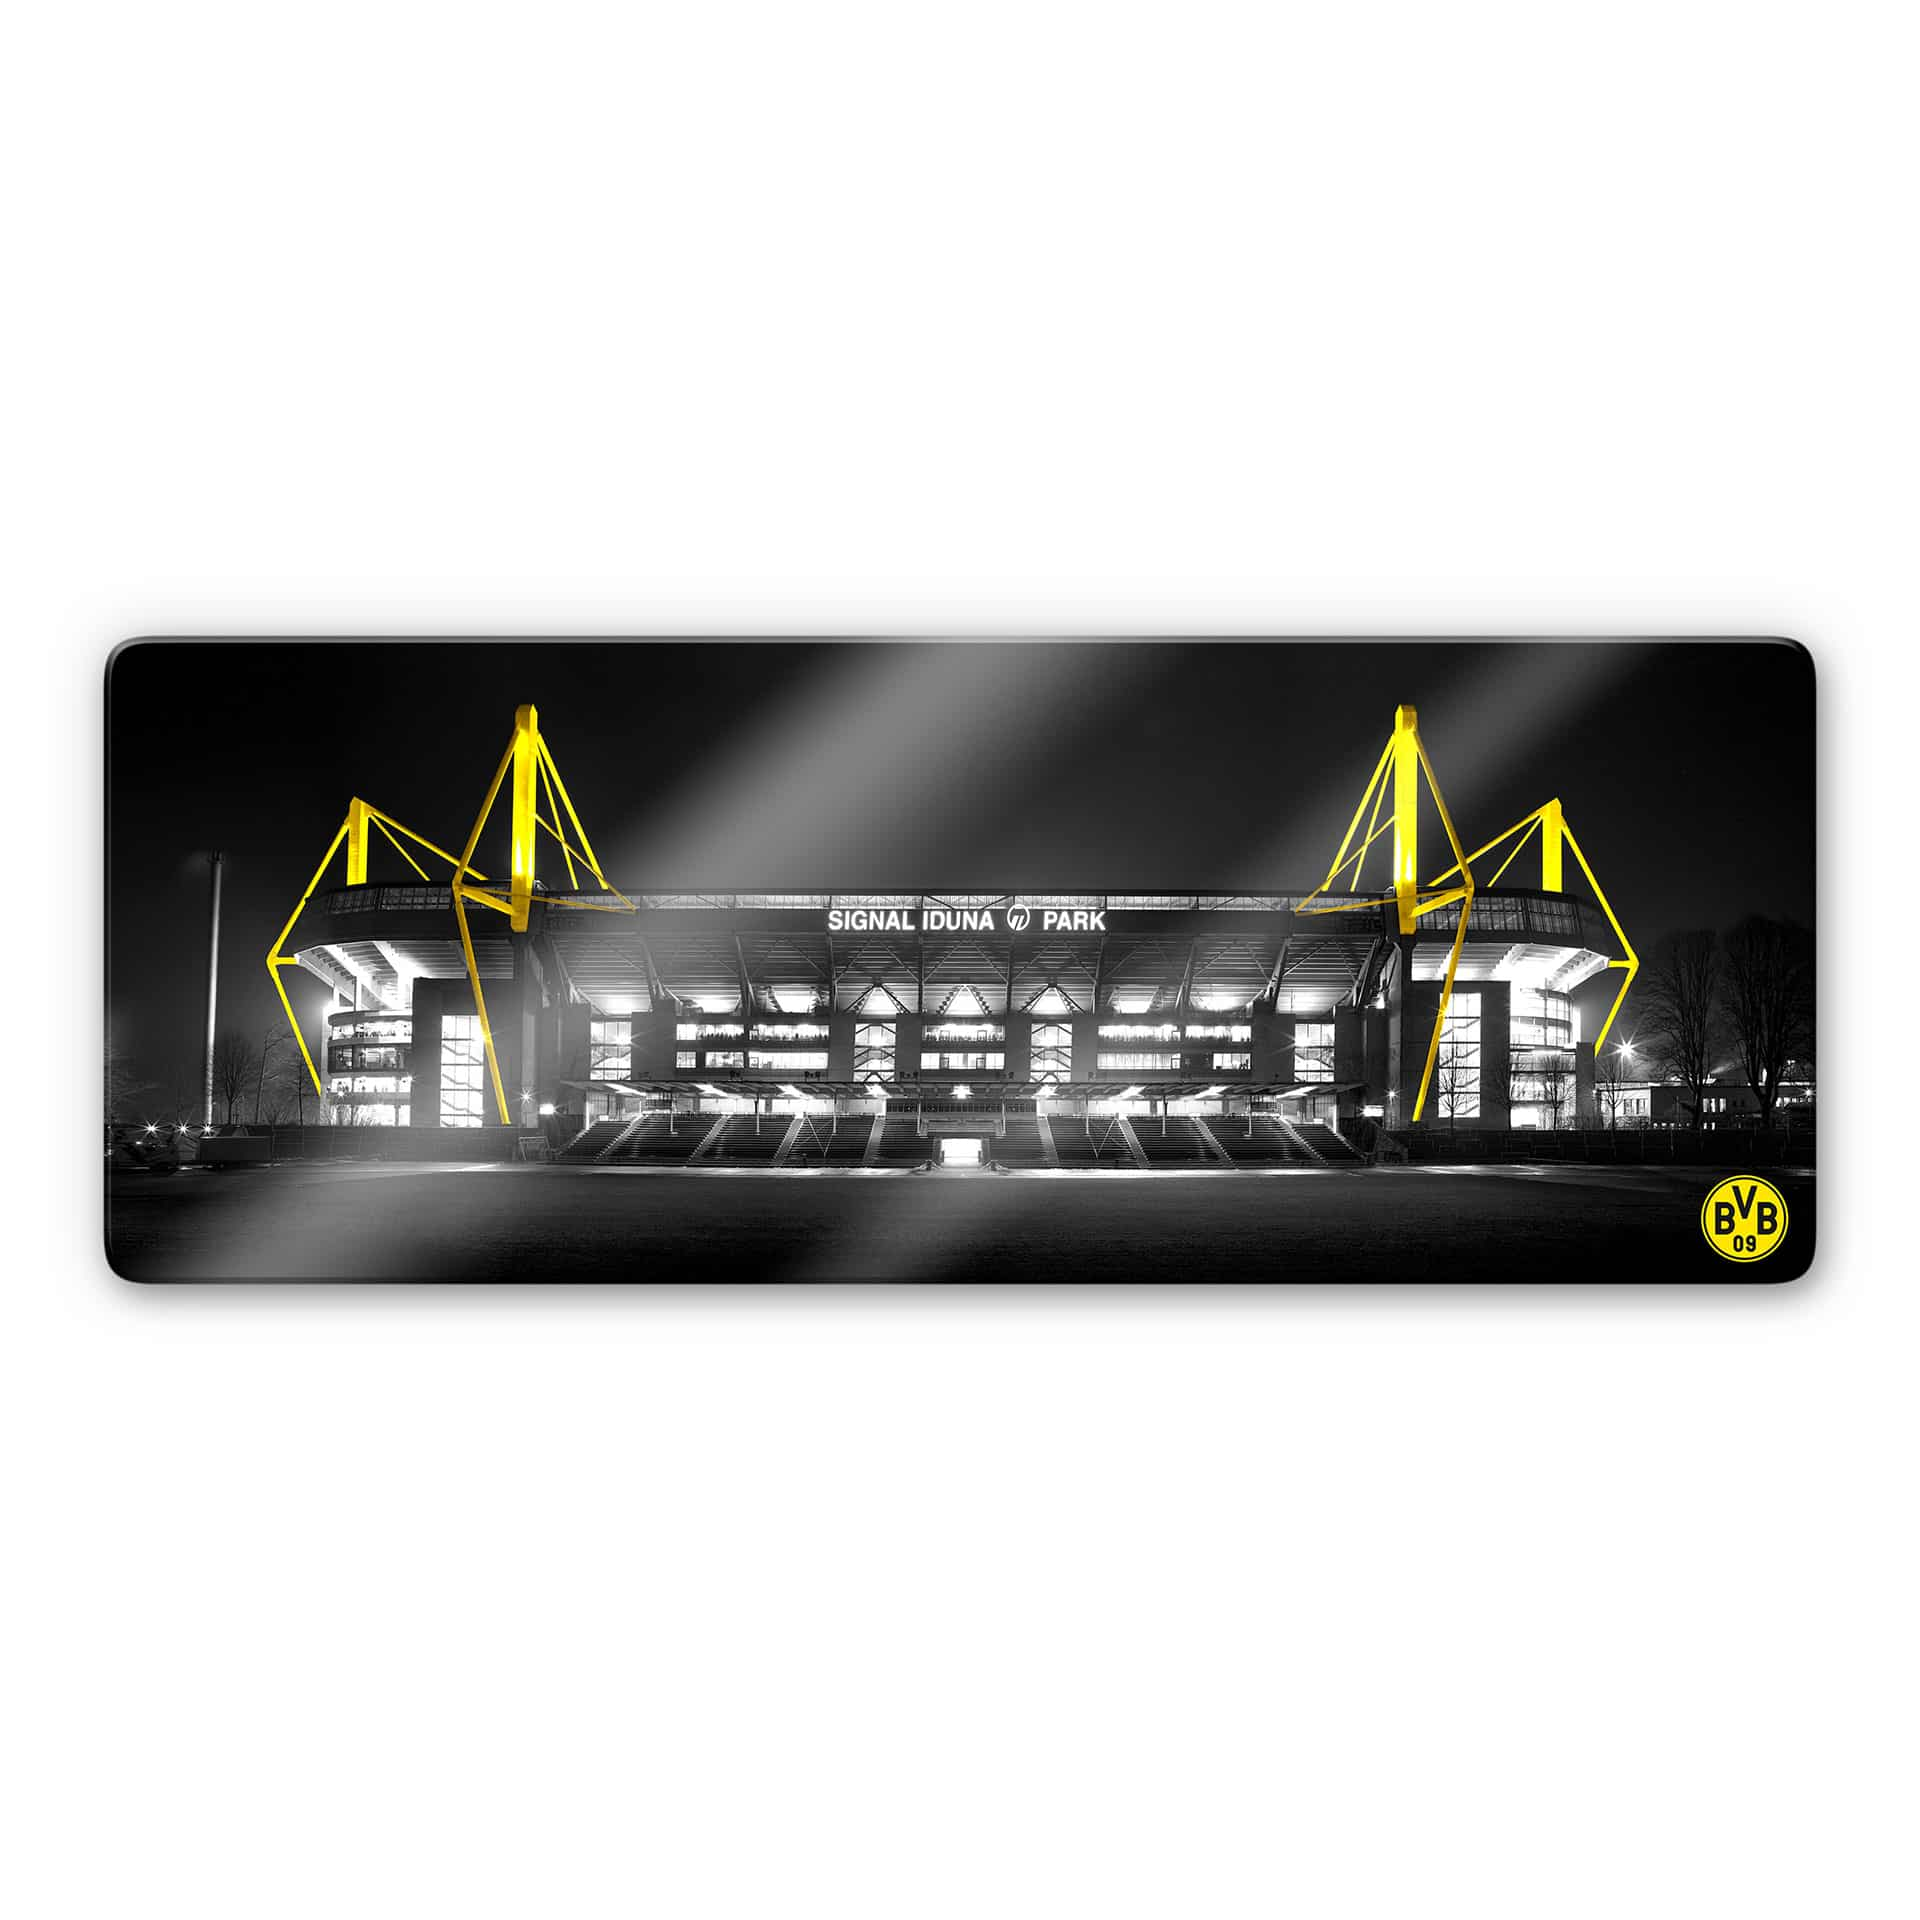 Glasbild BVB Signal Iduna Park bei Nacht mit Emblem Borussia Dortmund Fanshop